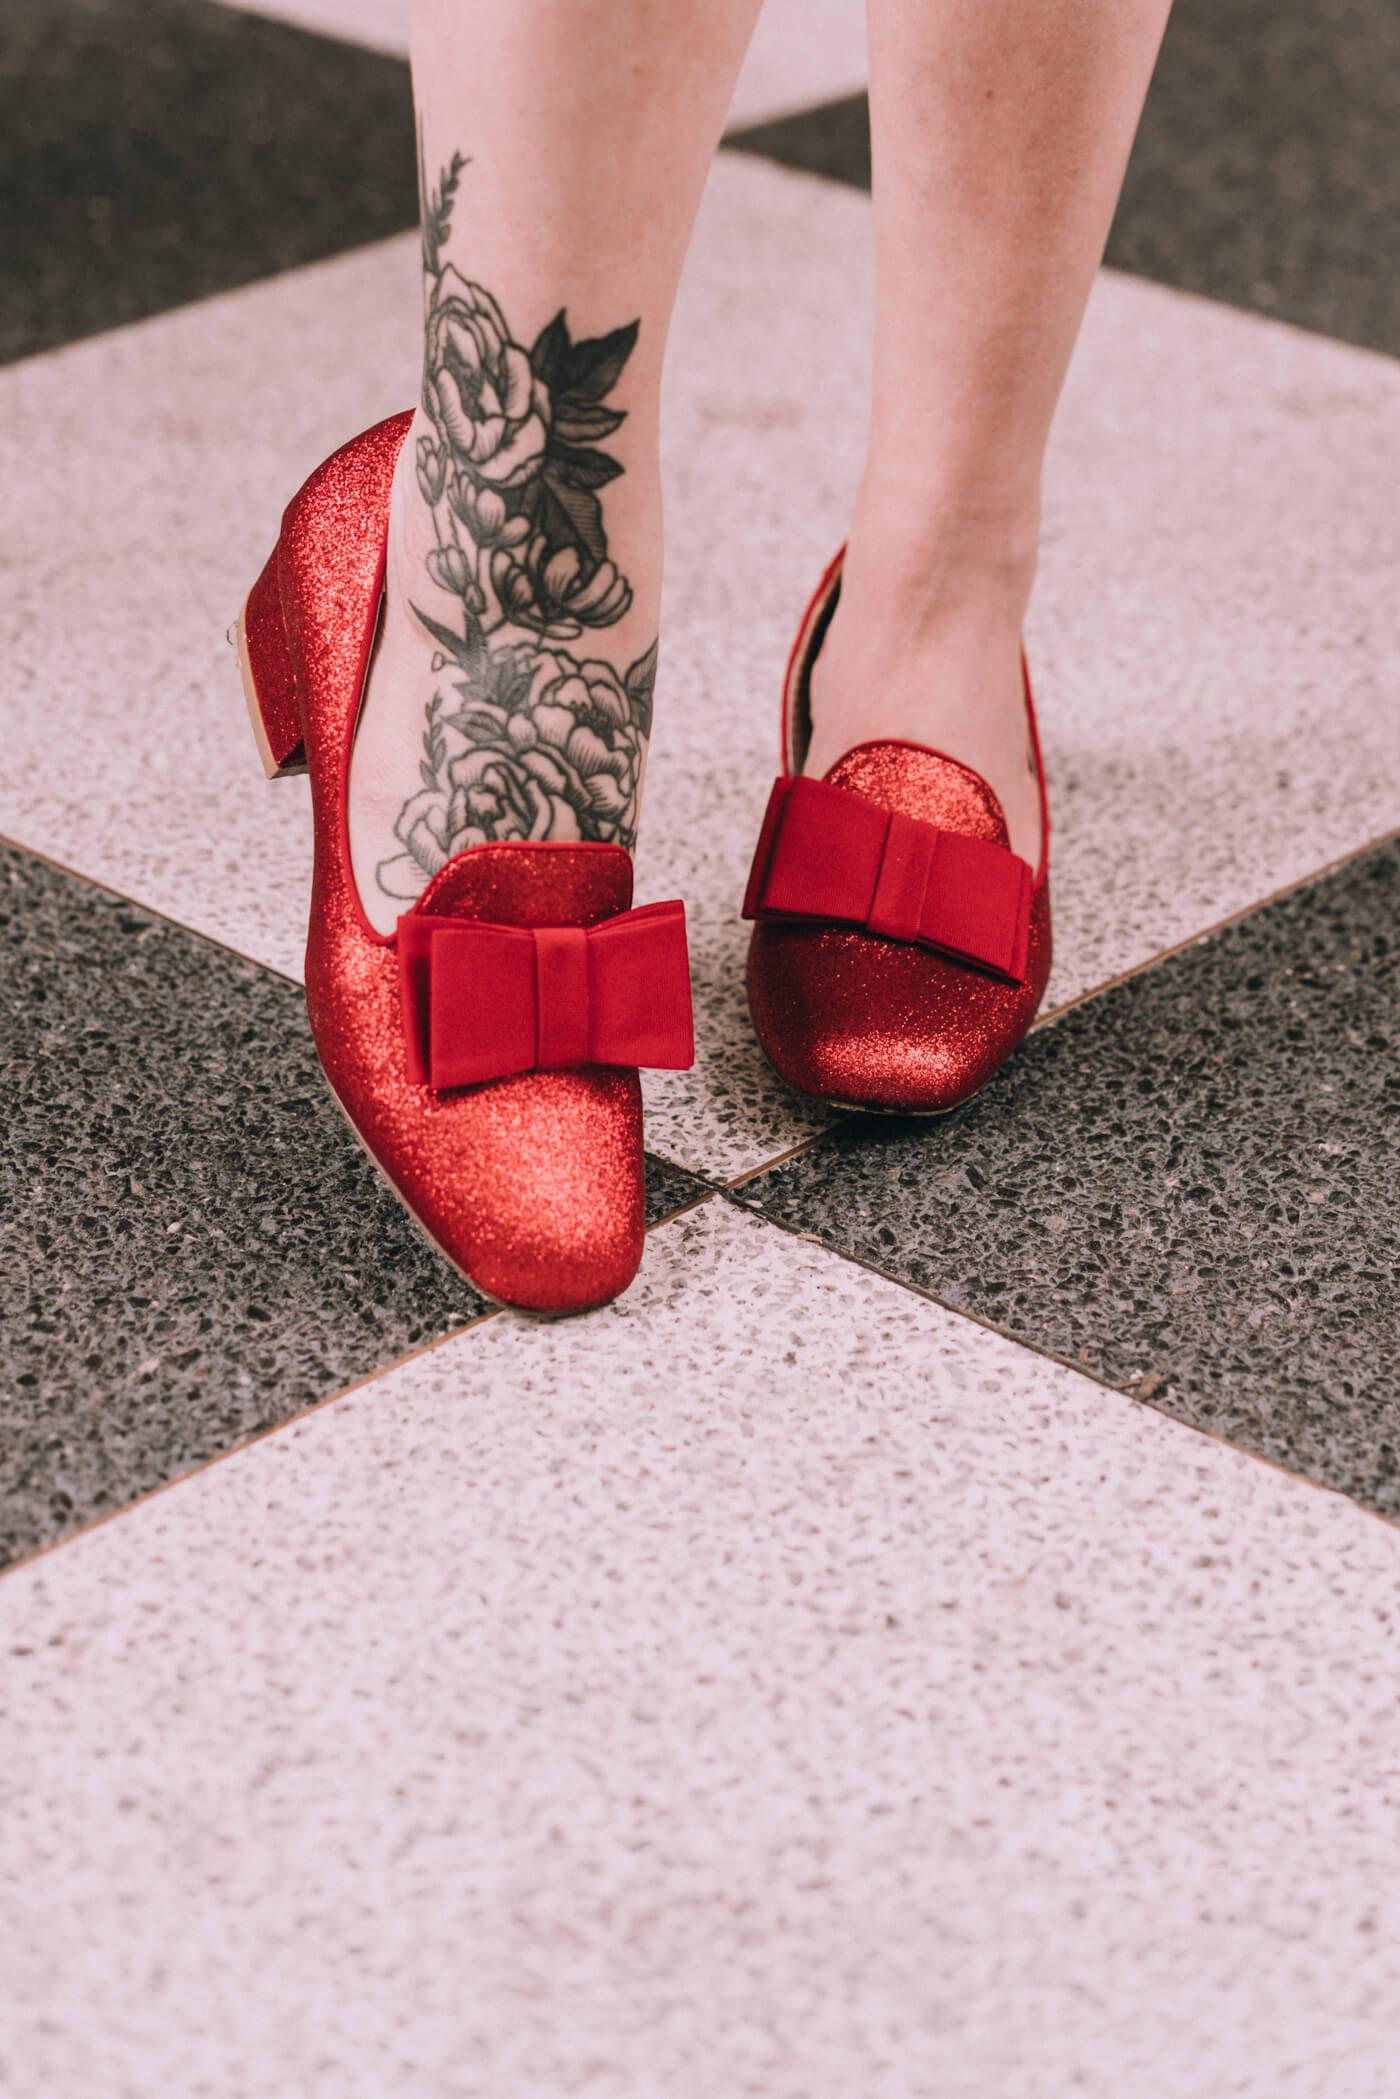 modcloth fall outfit ideas: B.A.I.T. footwear red glitter heels